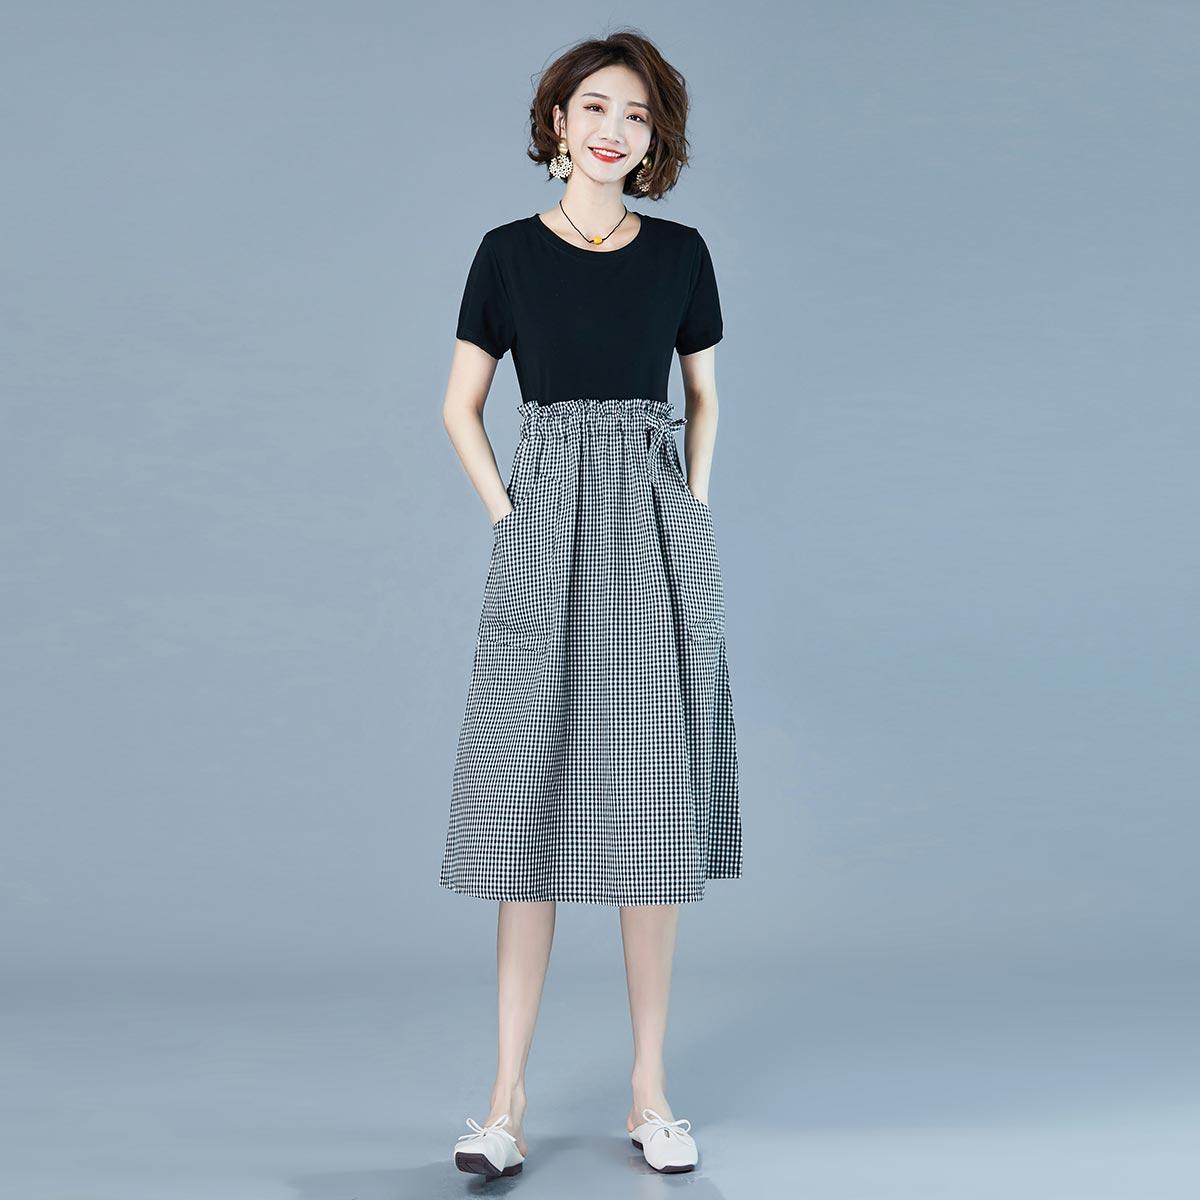 yf9圆领夏季新款宽松休闲舒适简约连衣裙XYCWX P110